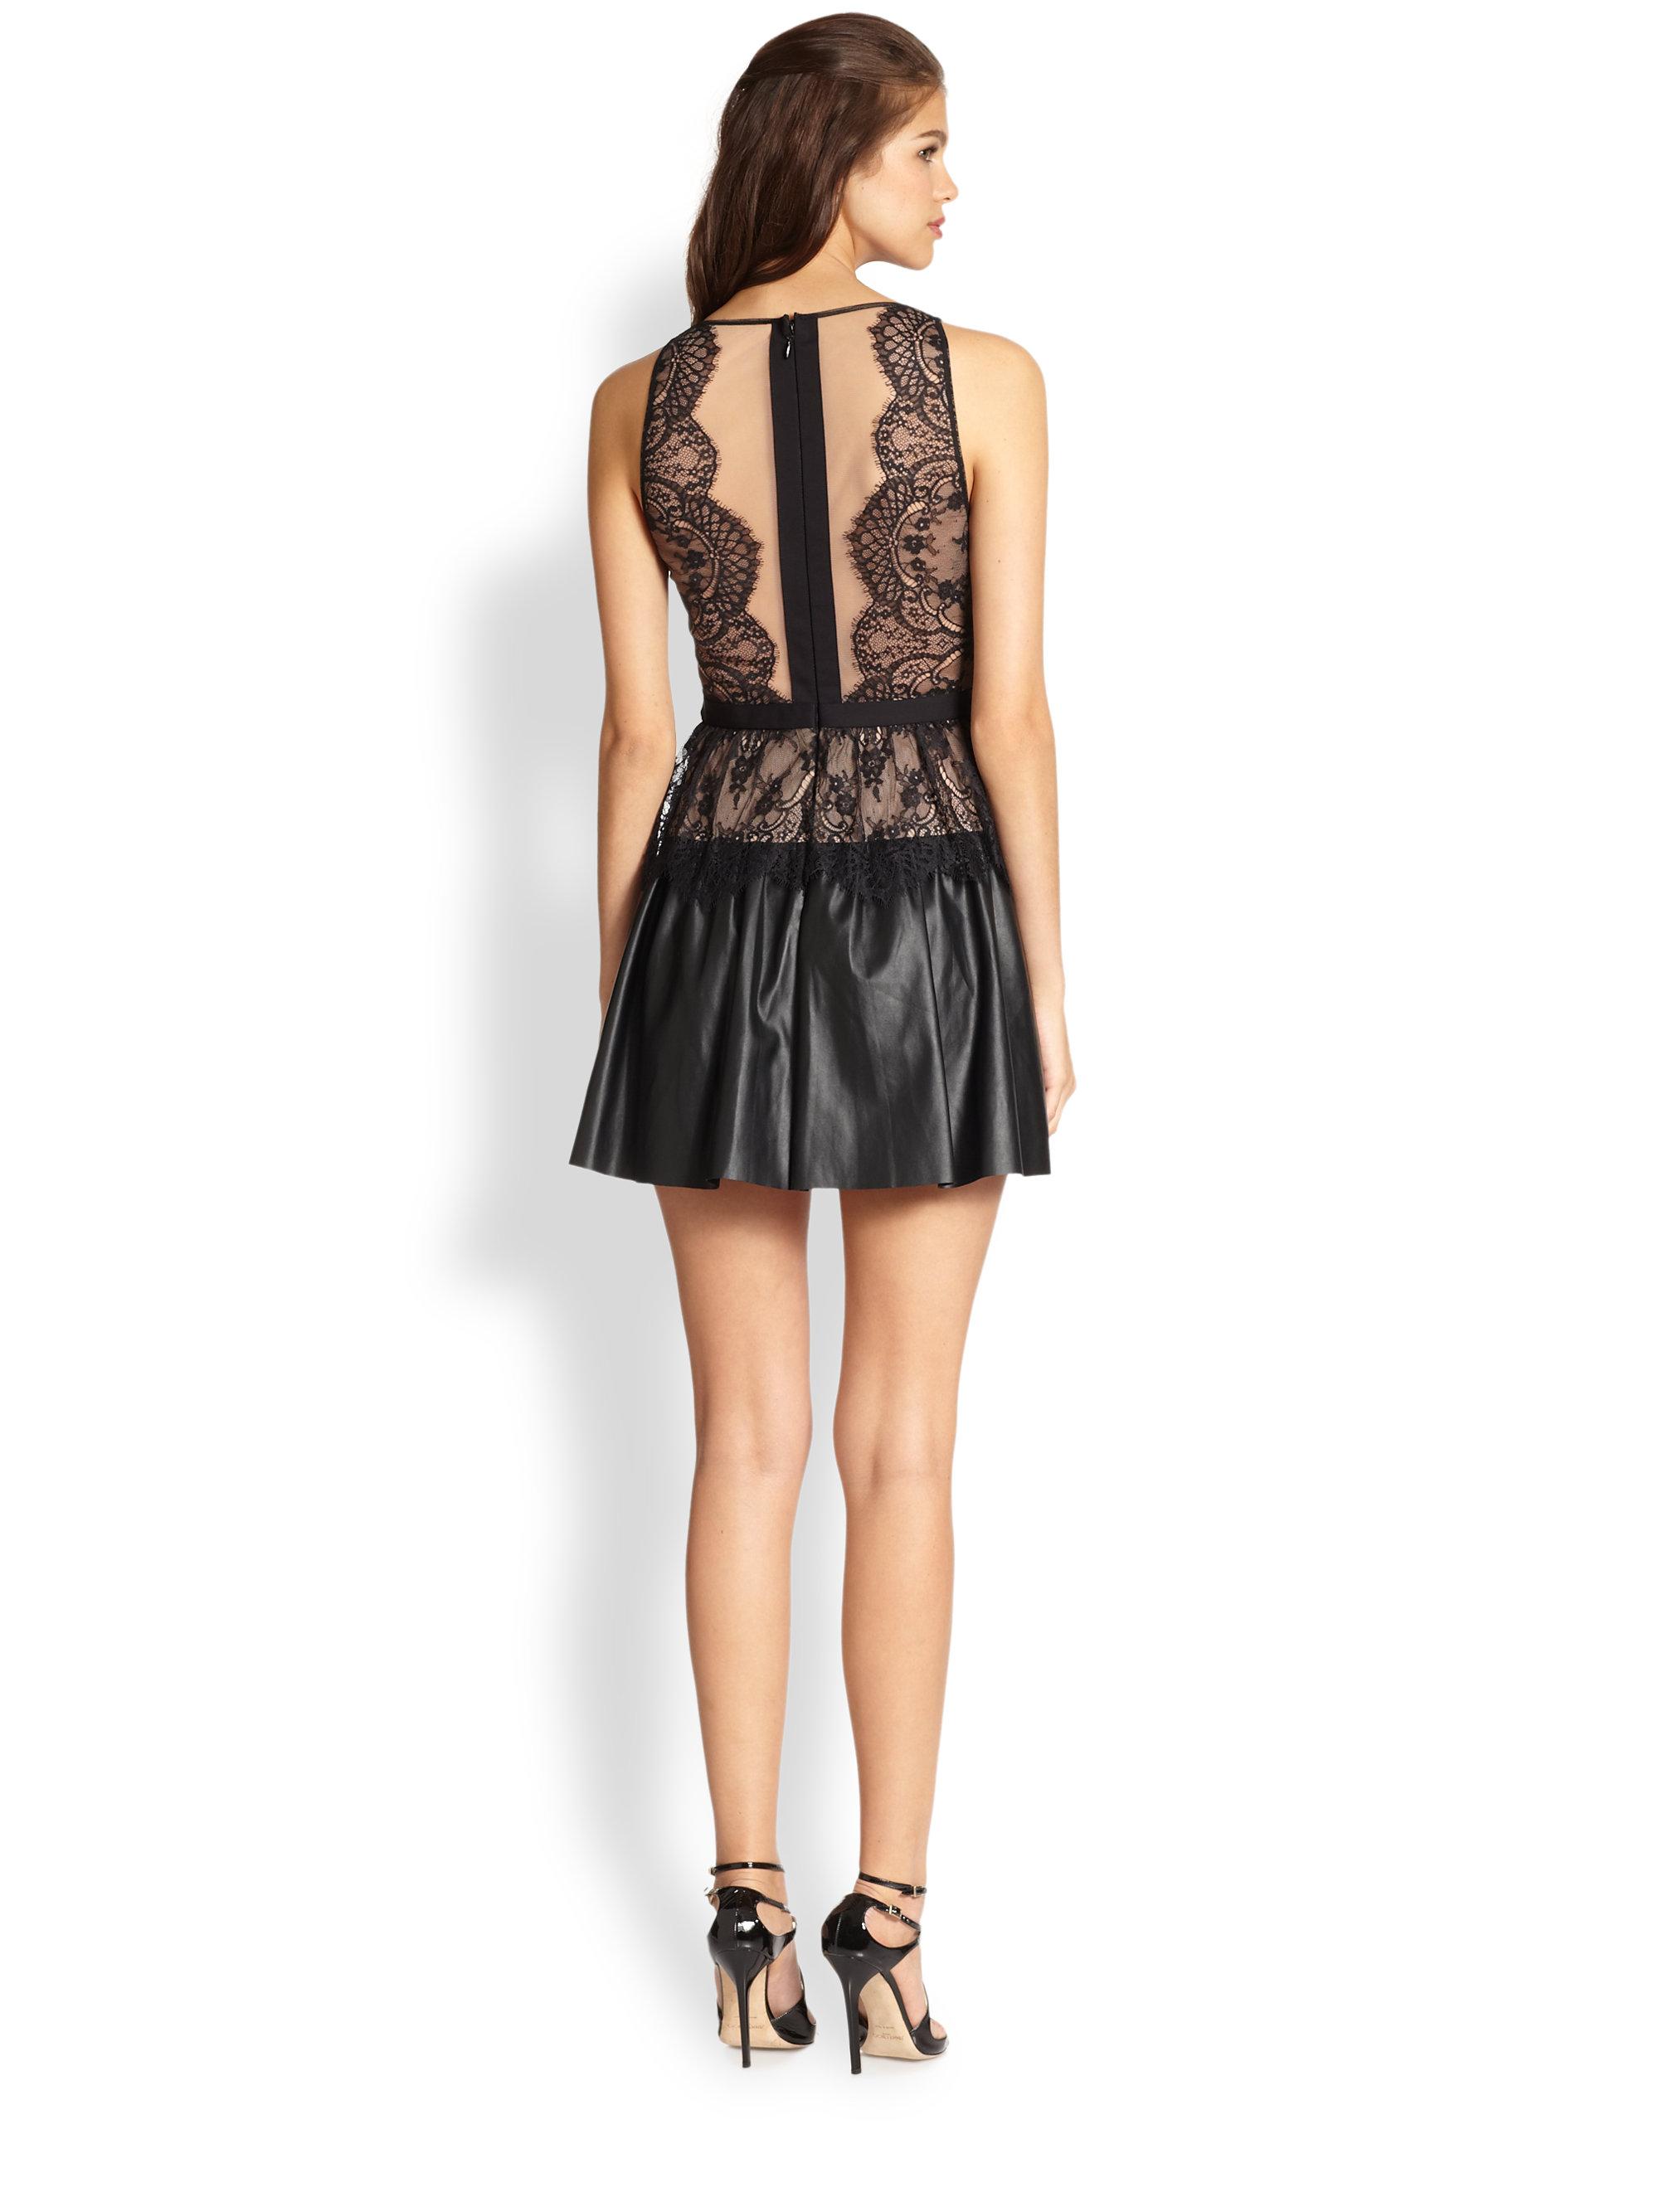 3219856b3f2 BCBGMAXAZRIA Layton Lace Faux Leather Dress in Black - Lyst